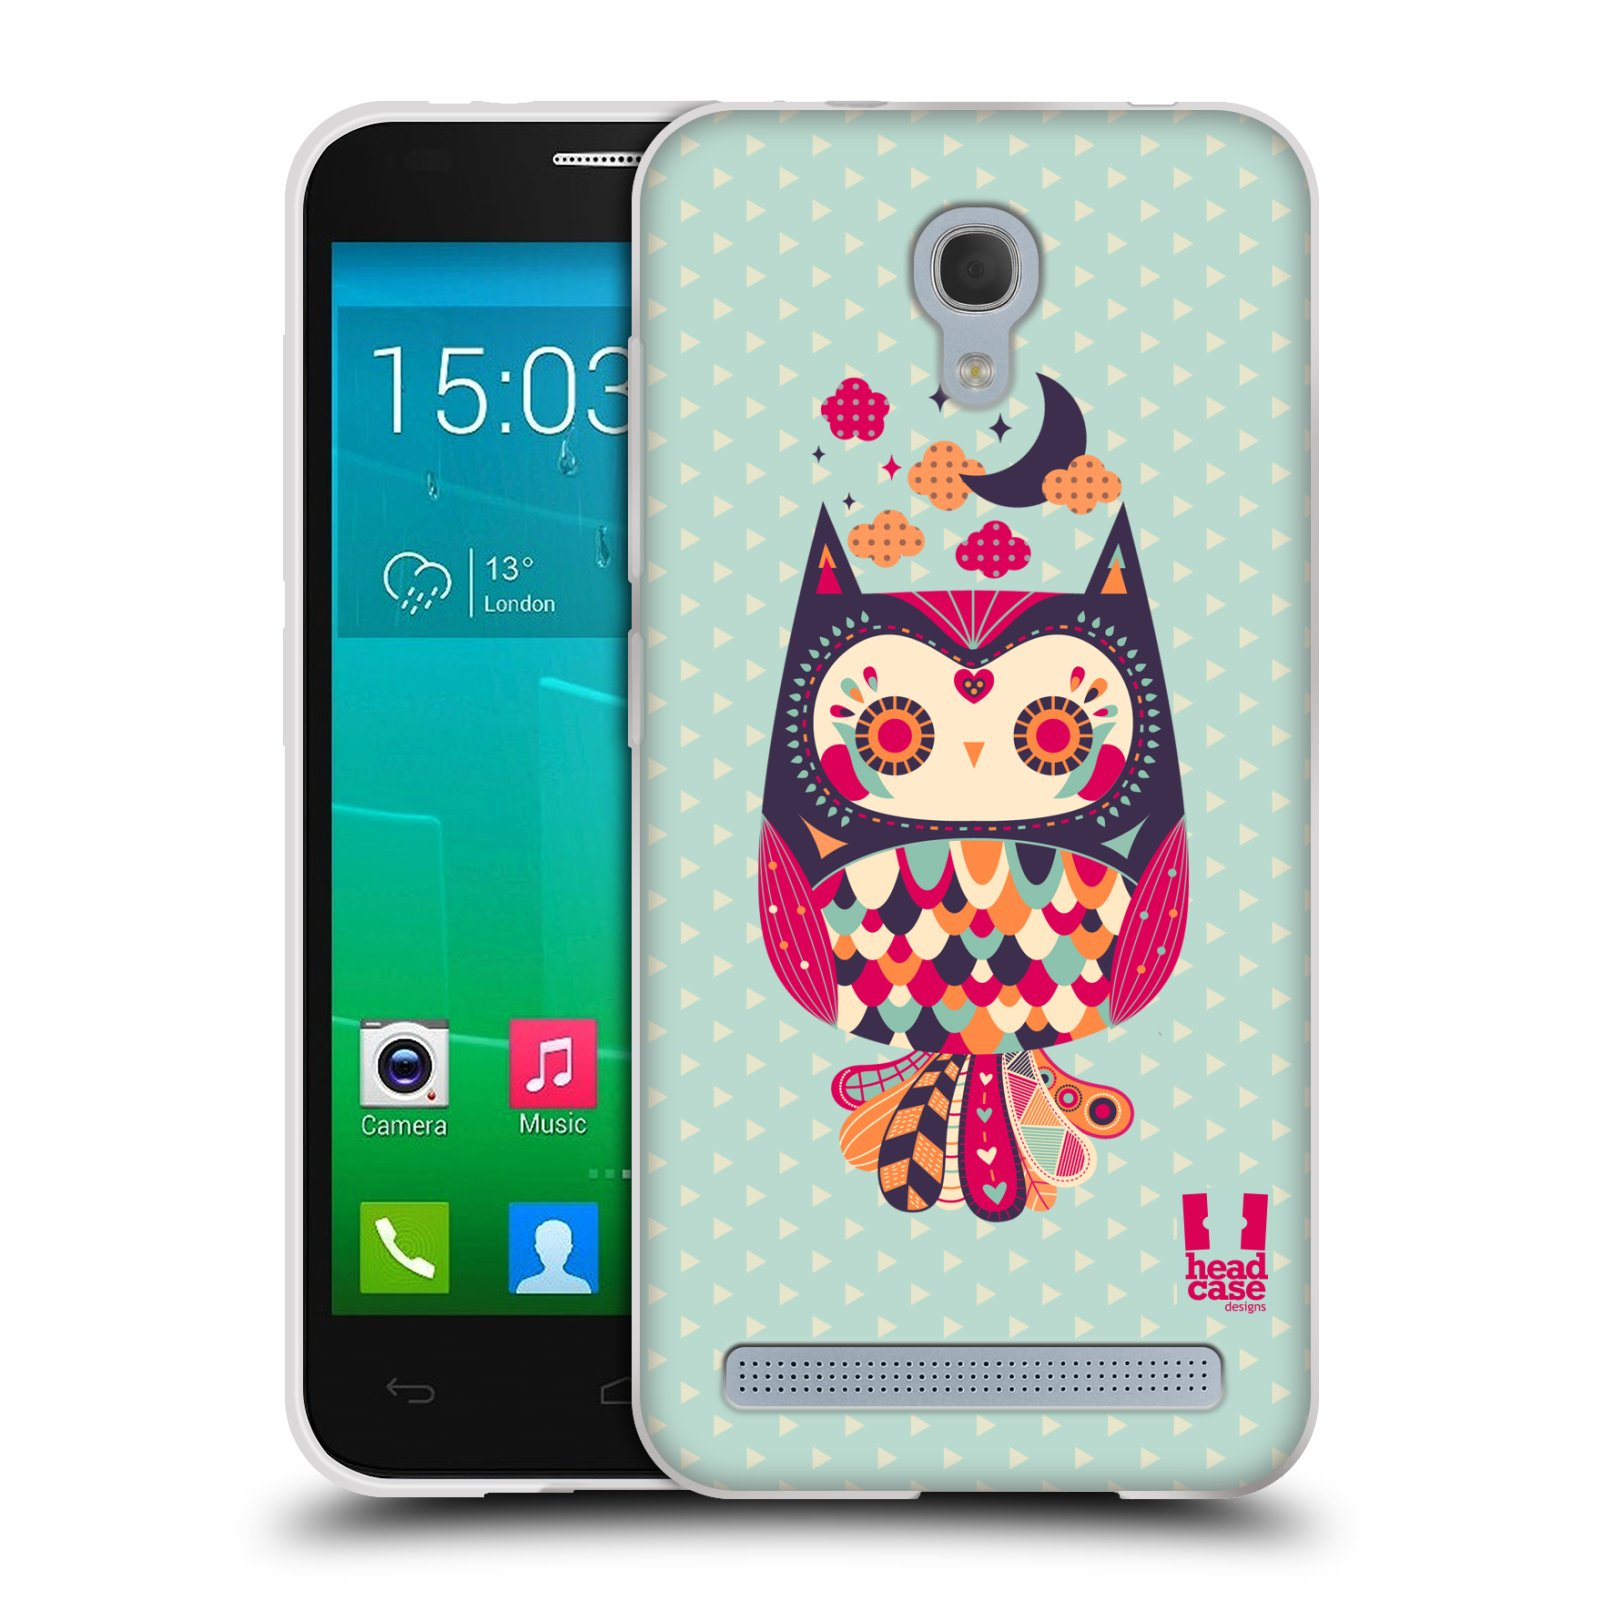 HEAD CASE silikonový obal na mobil Alcatel Idol 2 MINI S 6036Y vzor Stmívání sovička růžová a fialová